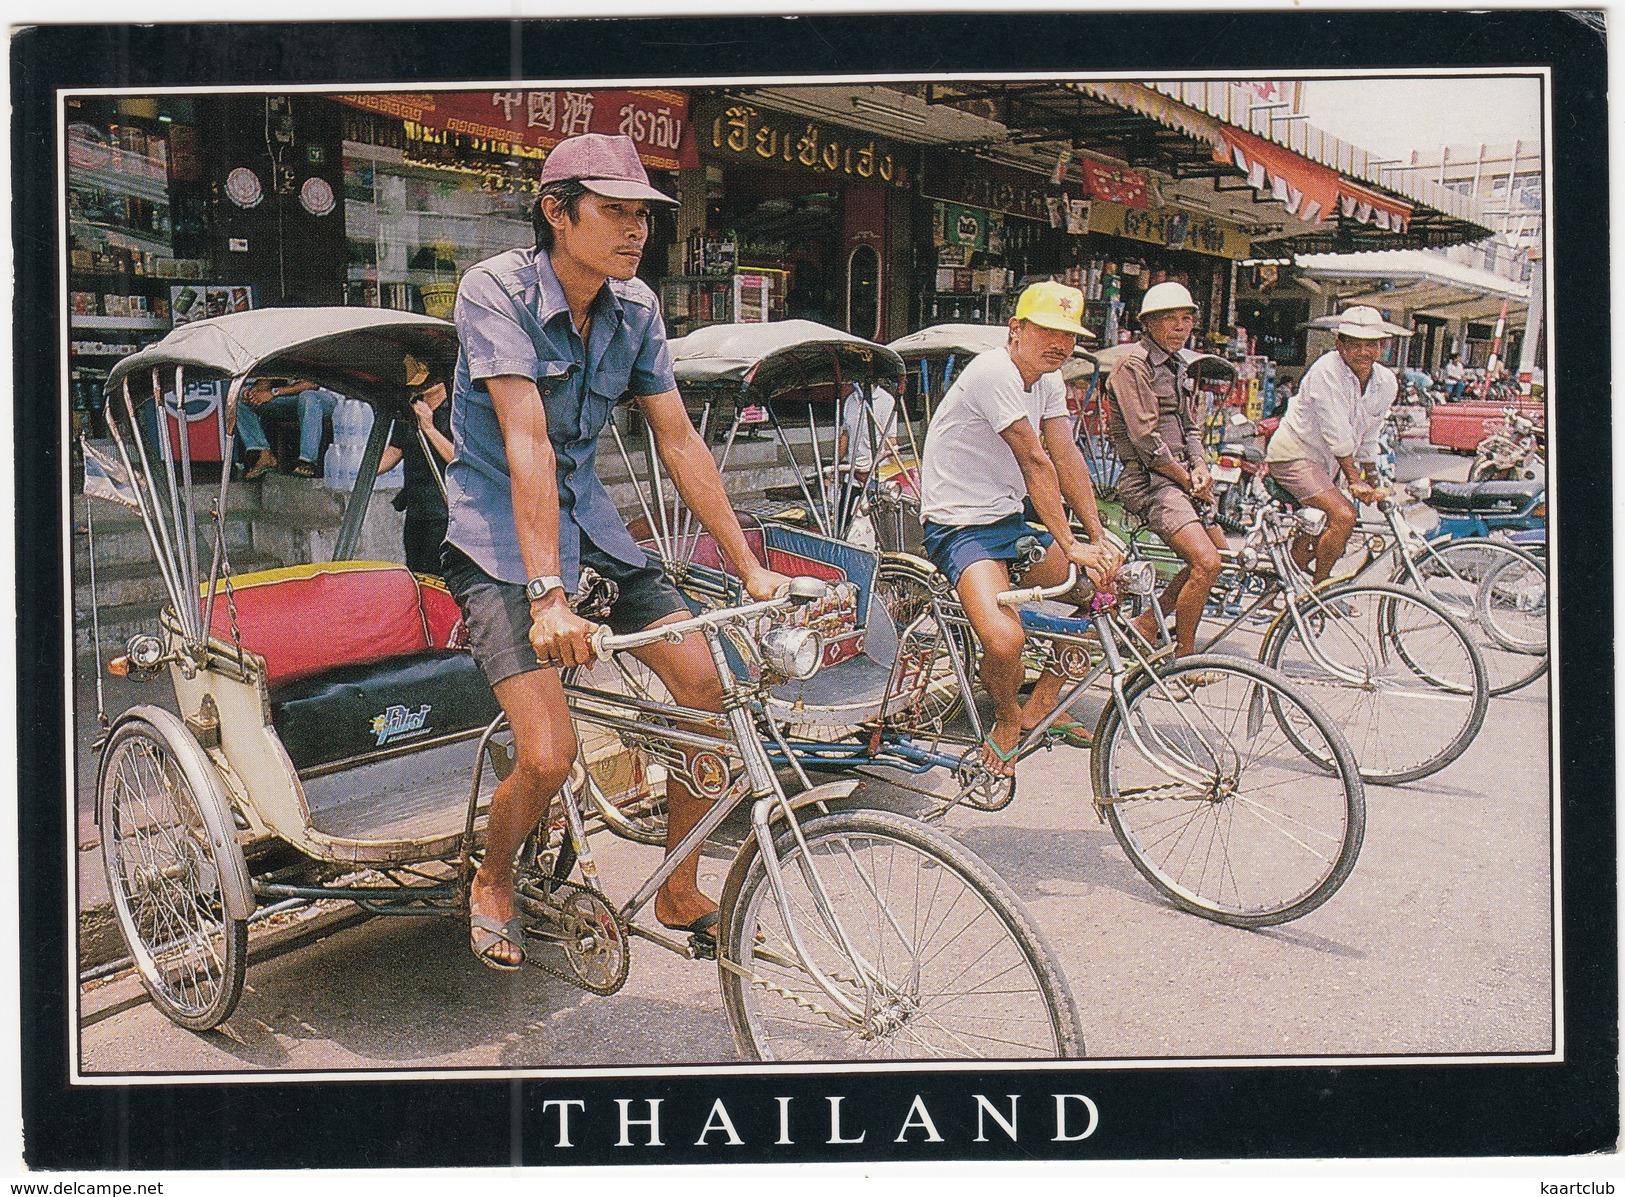 Bangkok: 4x RICKSHAW / TRICYCLE TAXI - (Thailand) - Taxis & Fiacres